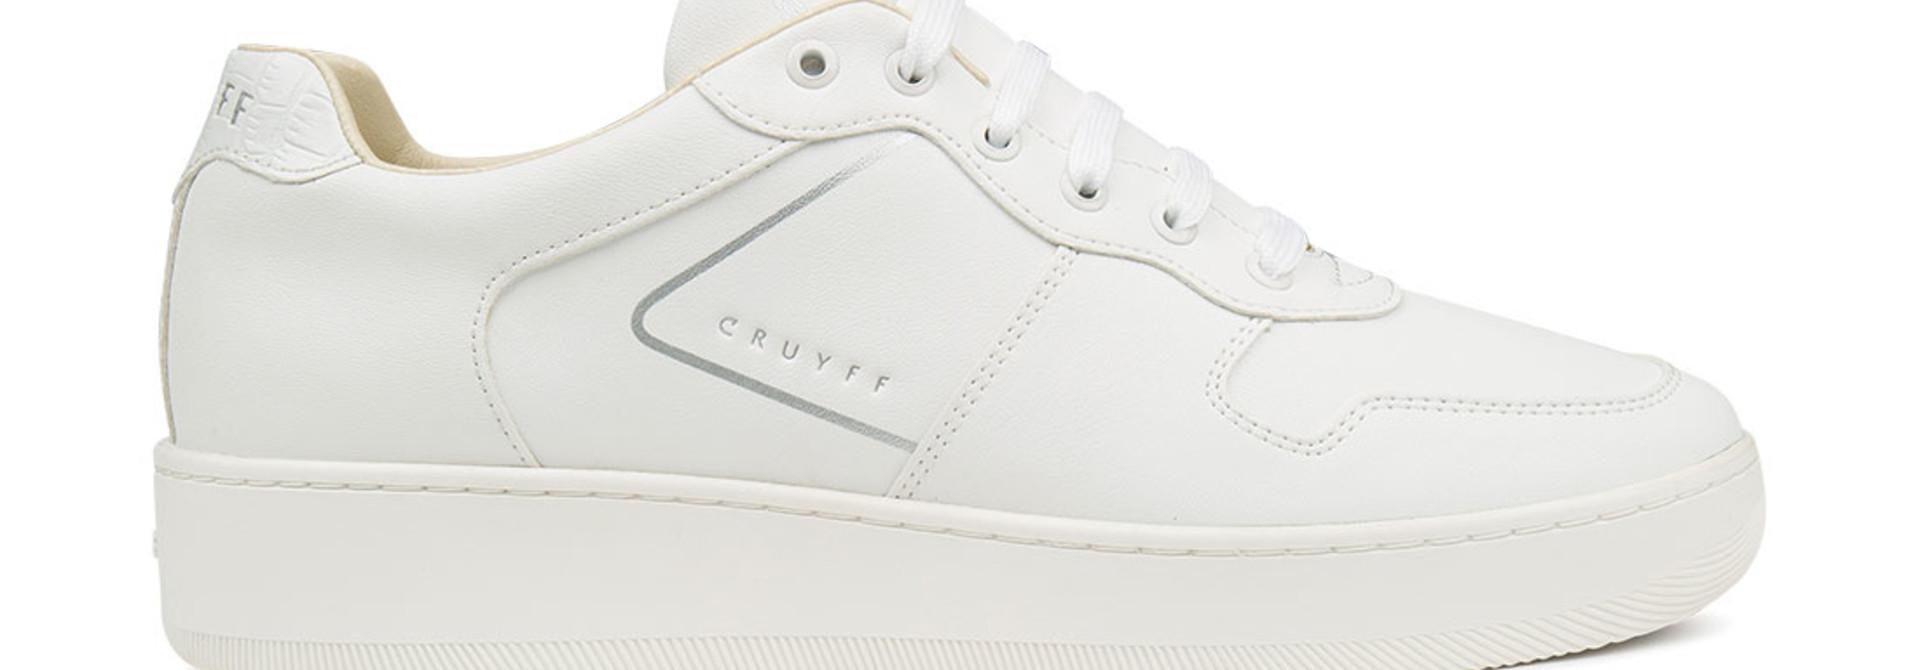 Cruyff Royal White